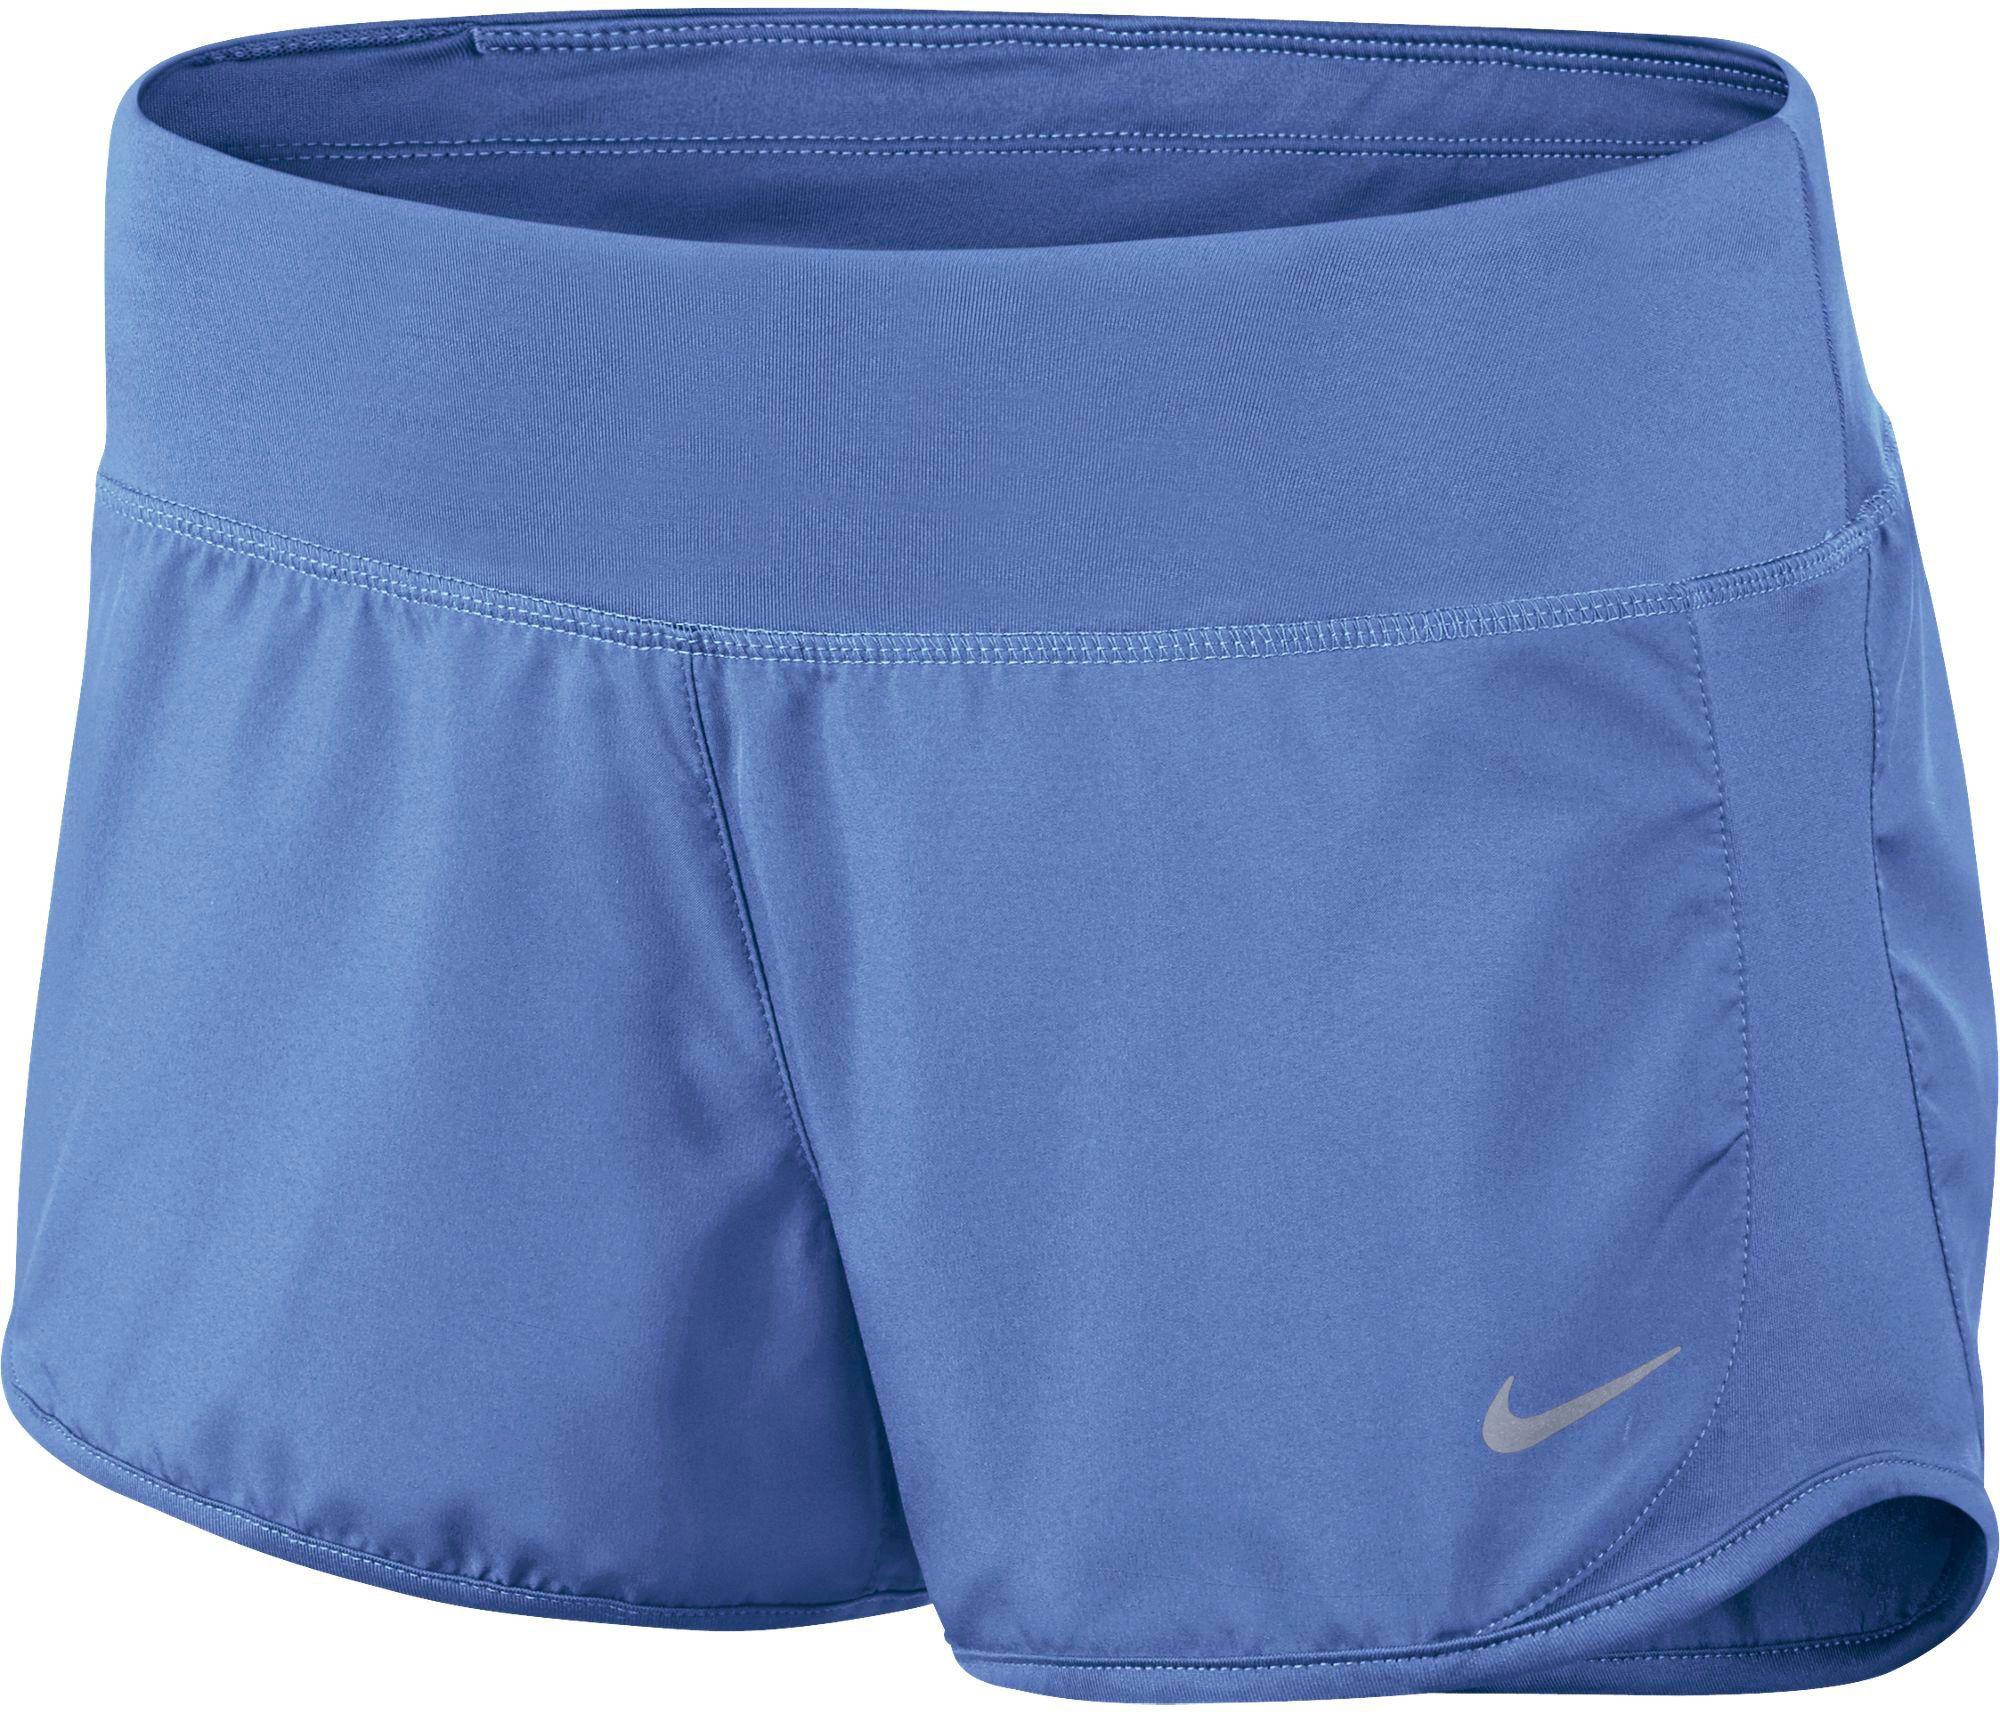 clearance nike running shorts for women nike golf pants 32 30